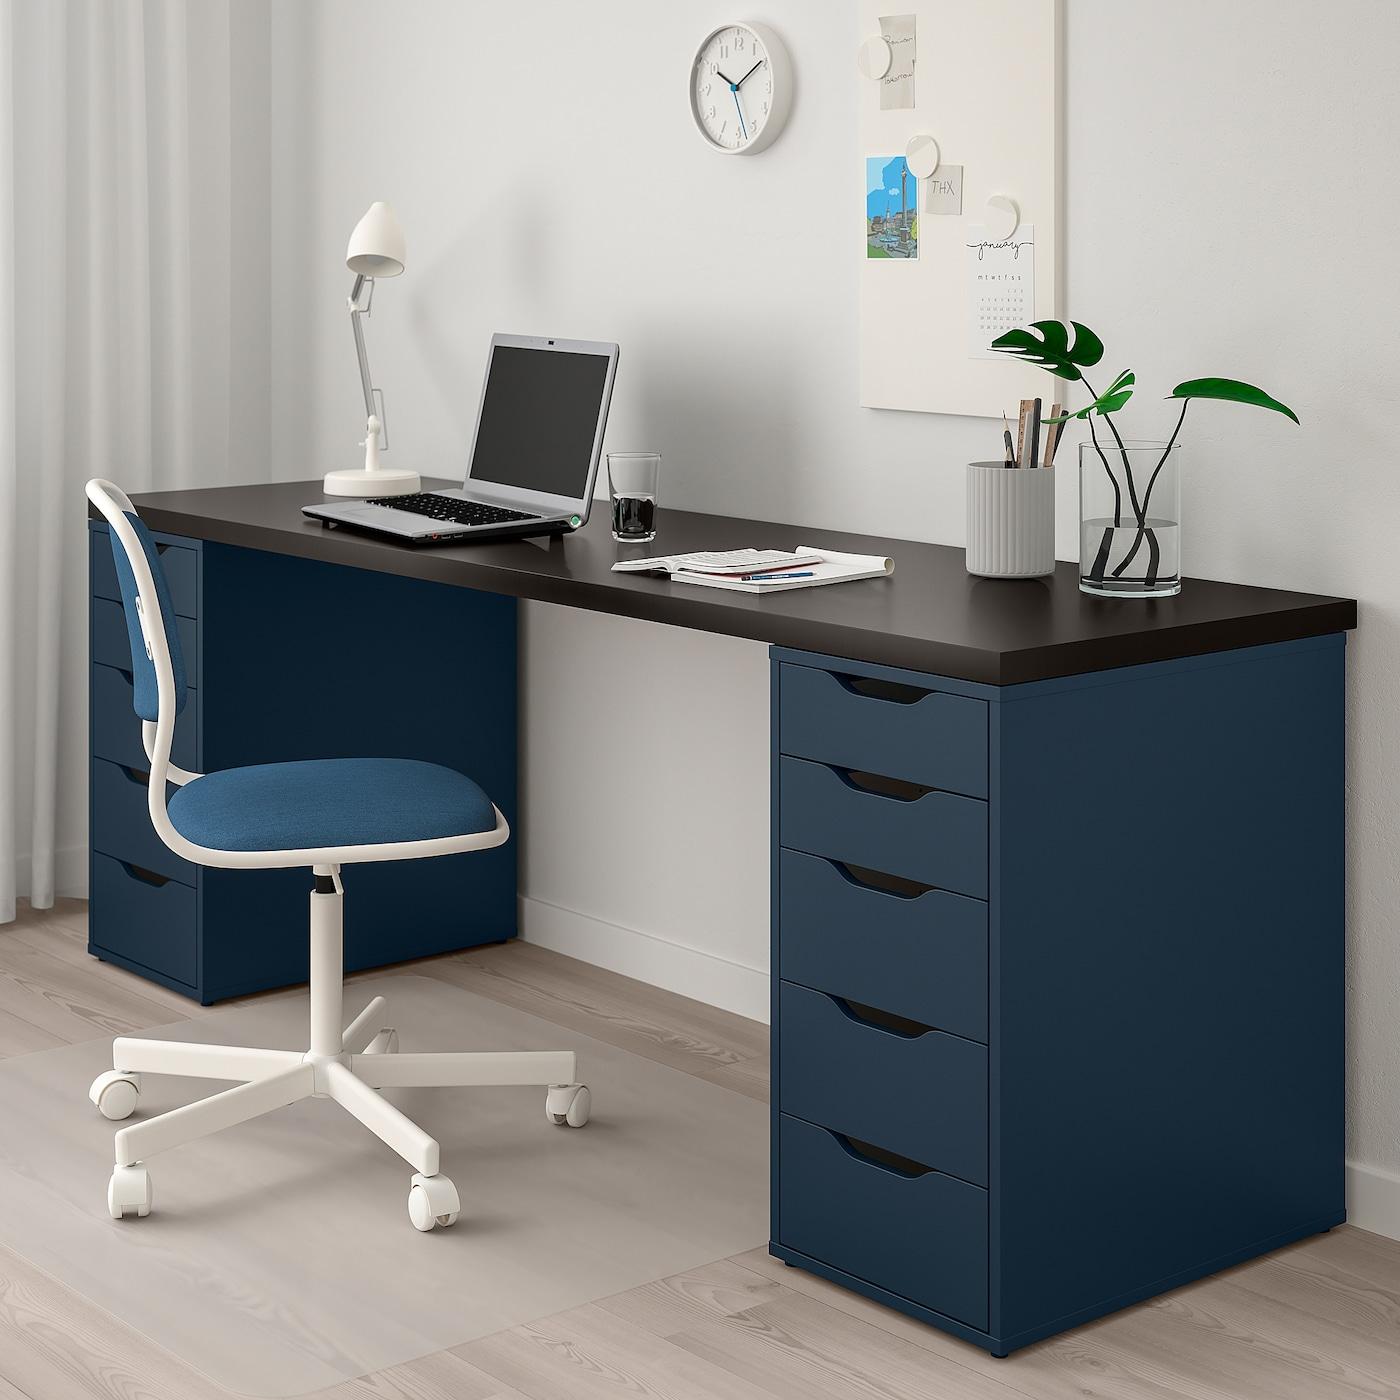 LINNMON Bordsskiva, svartbrun, 200x60 cm IKEA